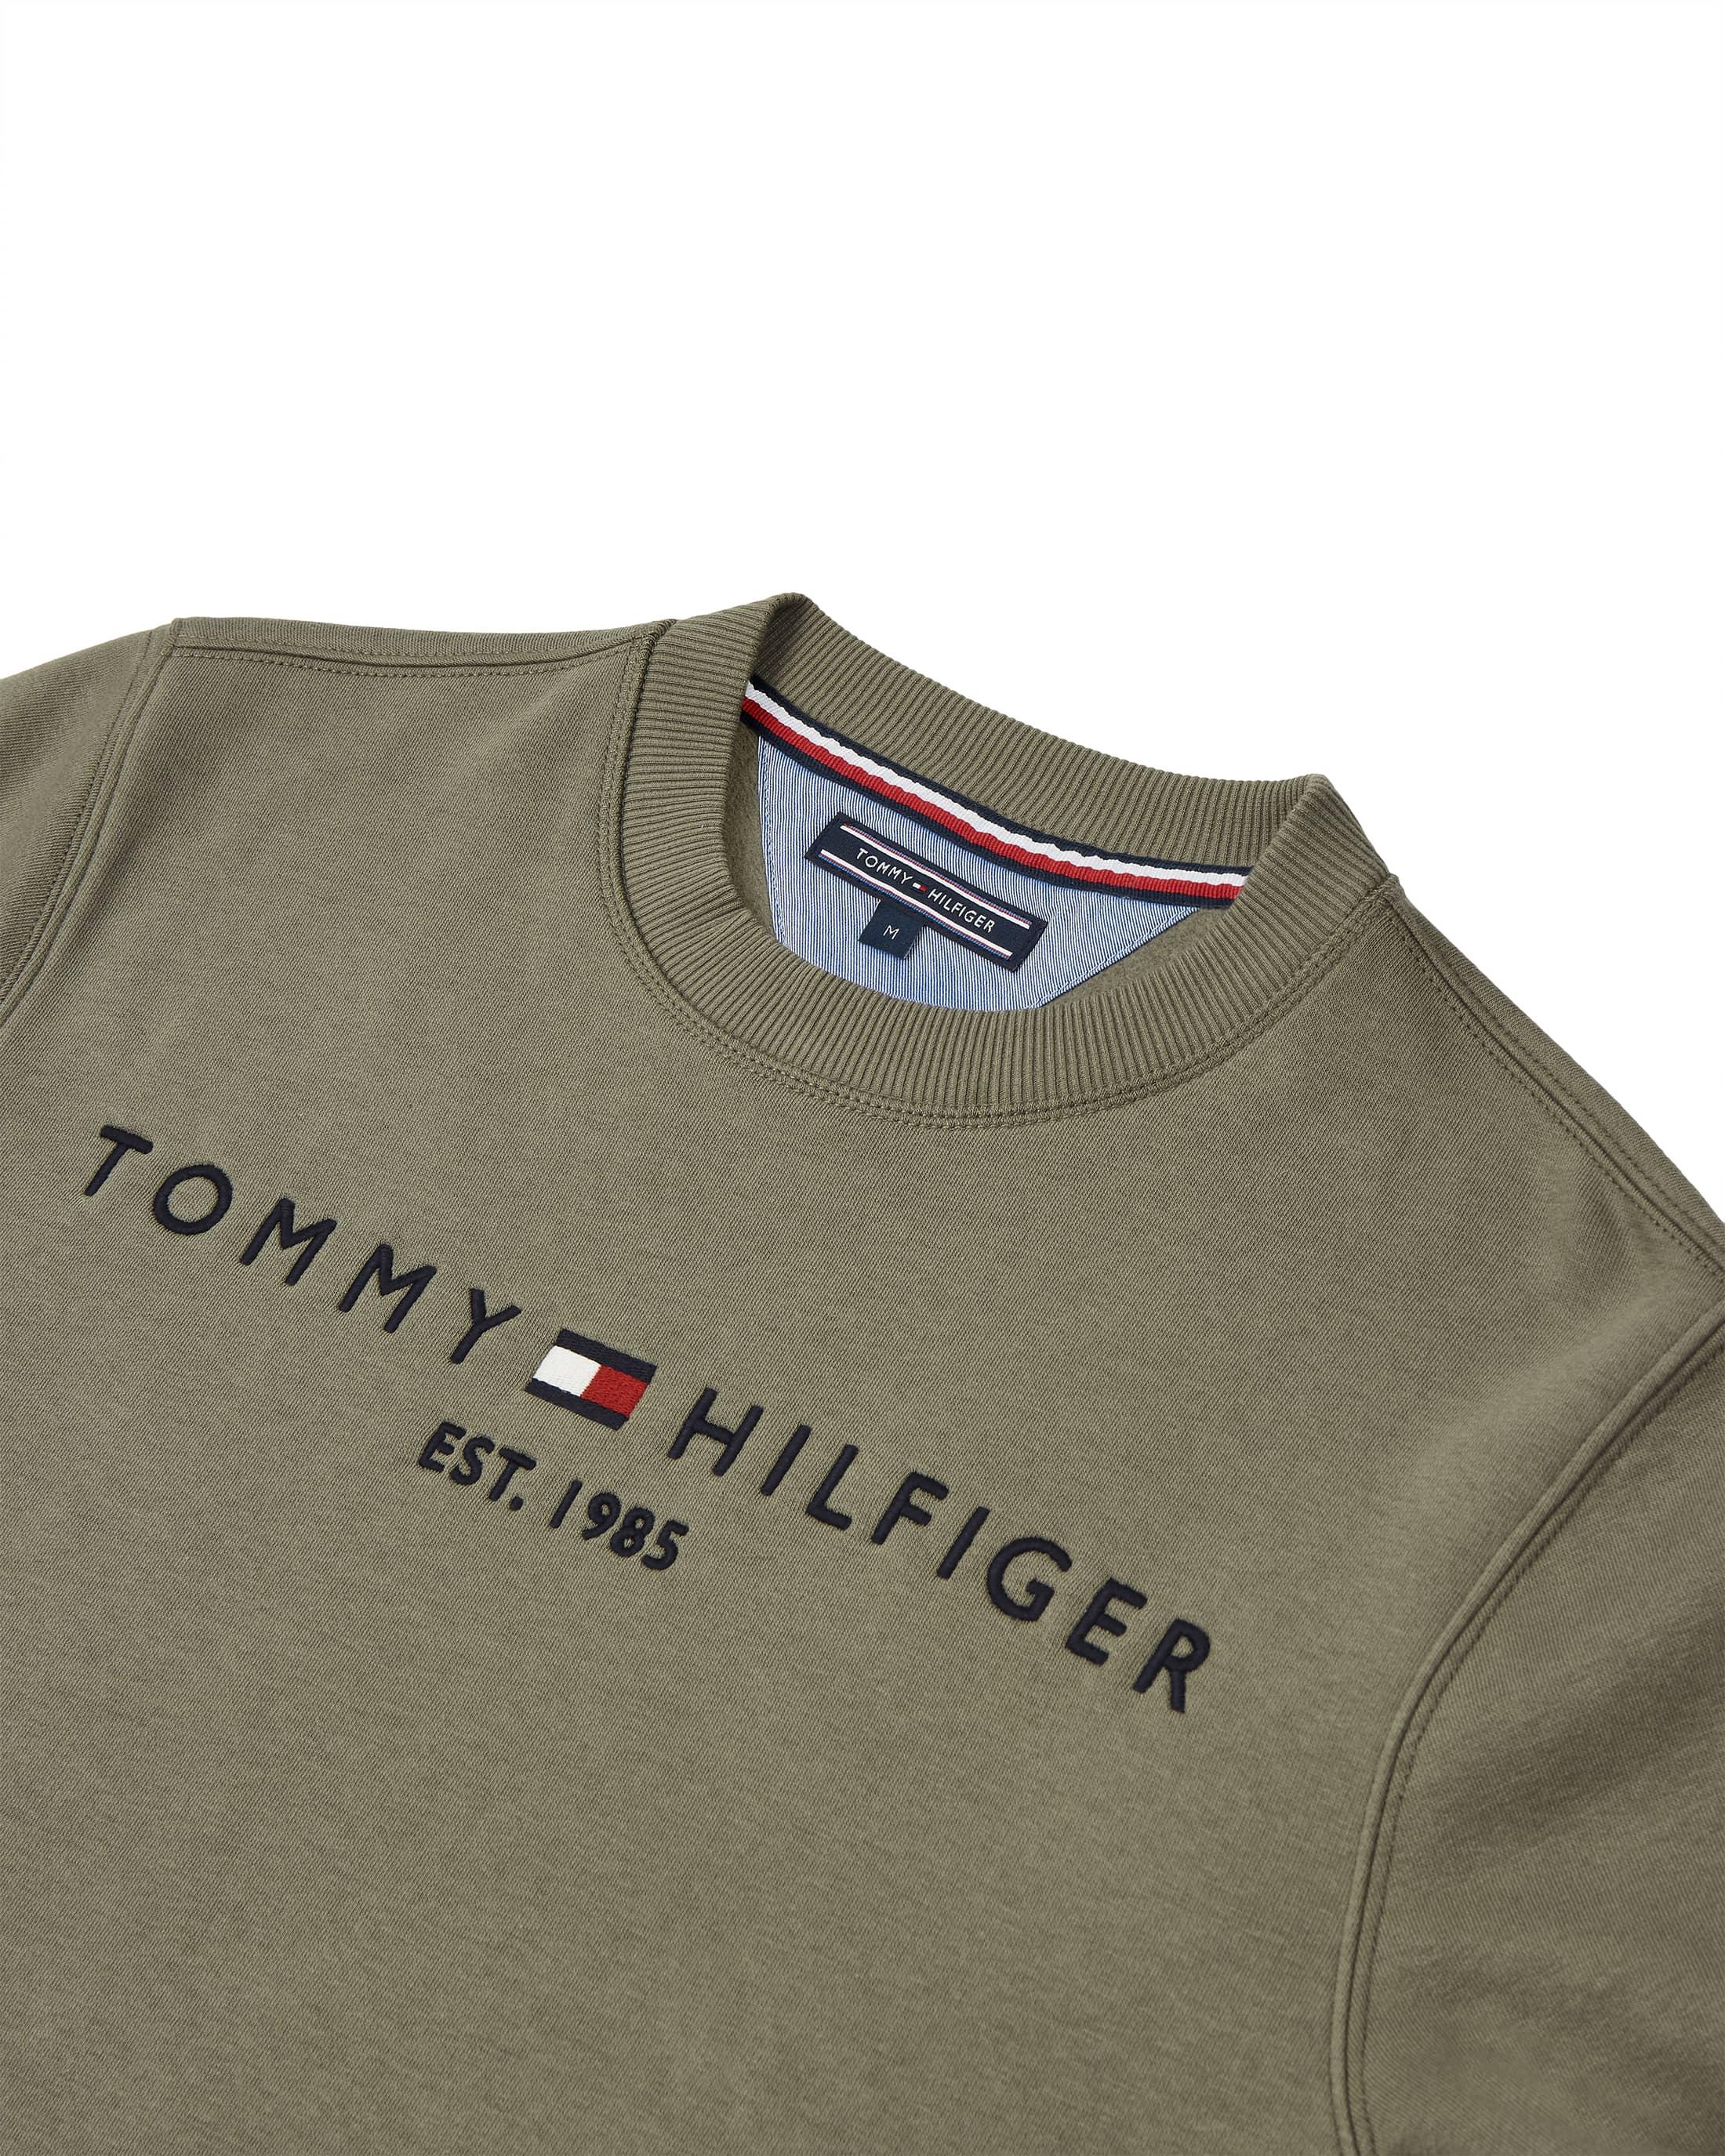 Tommy Hilfiger Sweater Olive foto 1